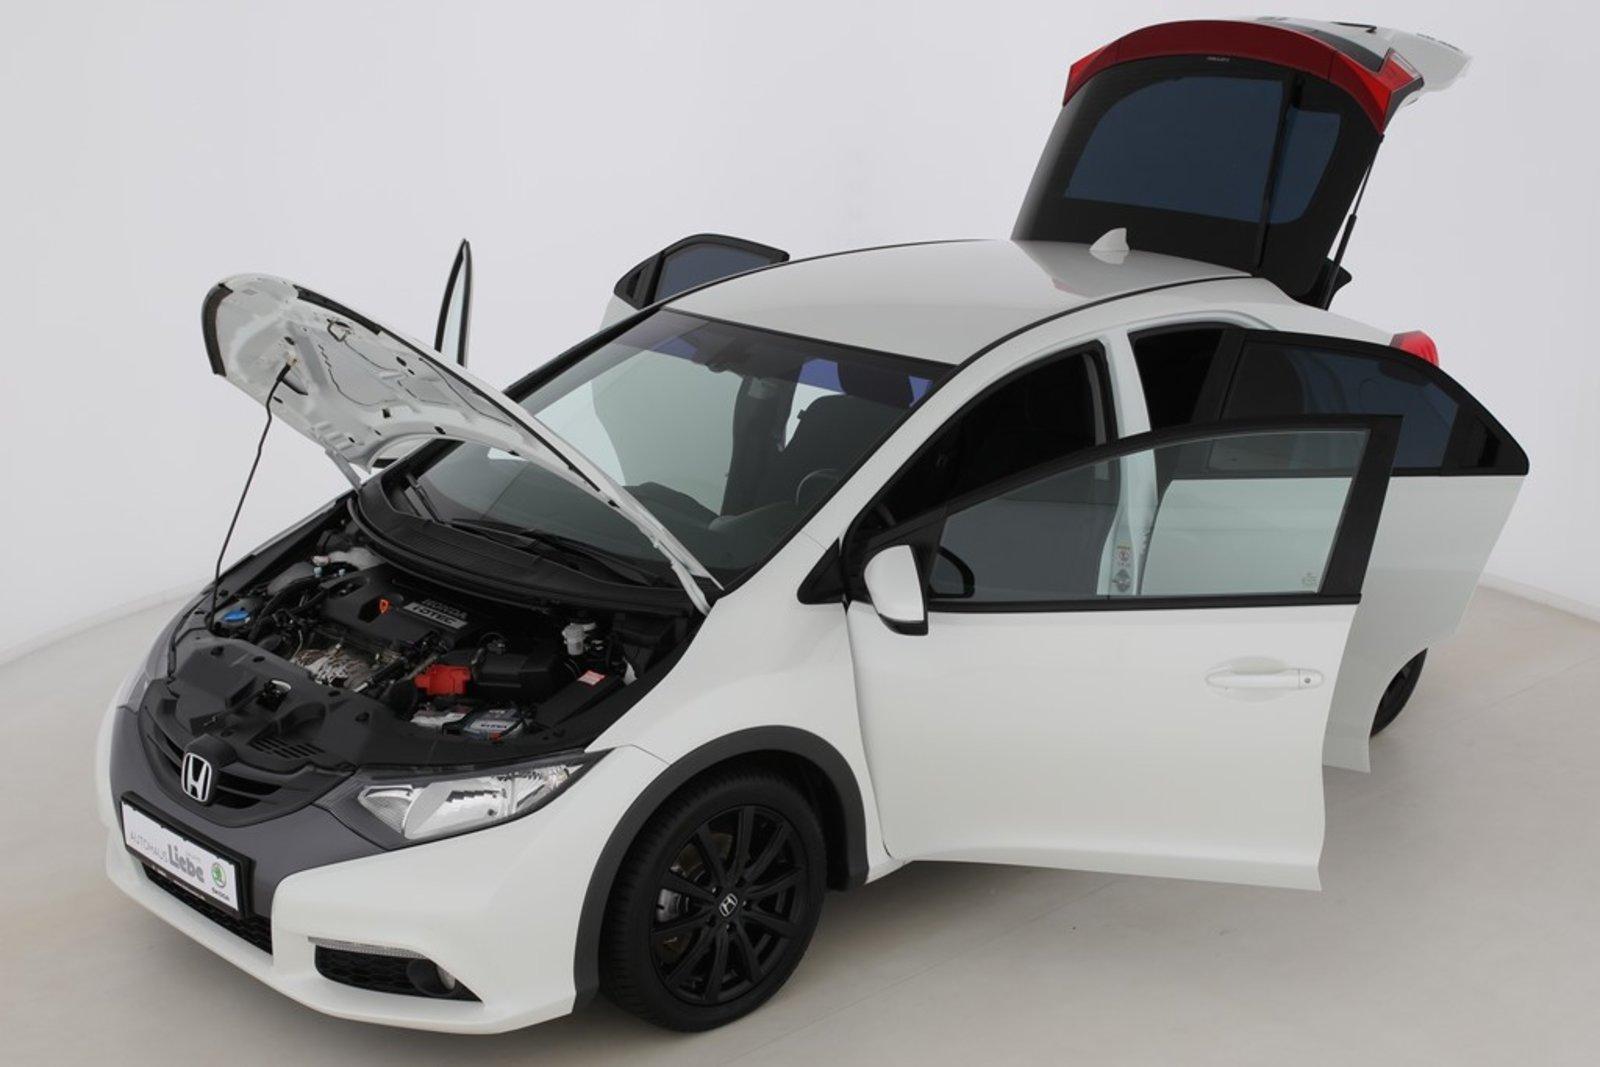 Honda CIVIC LIM 5 2.2 iDTEC SPORT KAMERA|TEMPOMAT, Jahr 2012, diesel